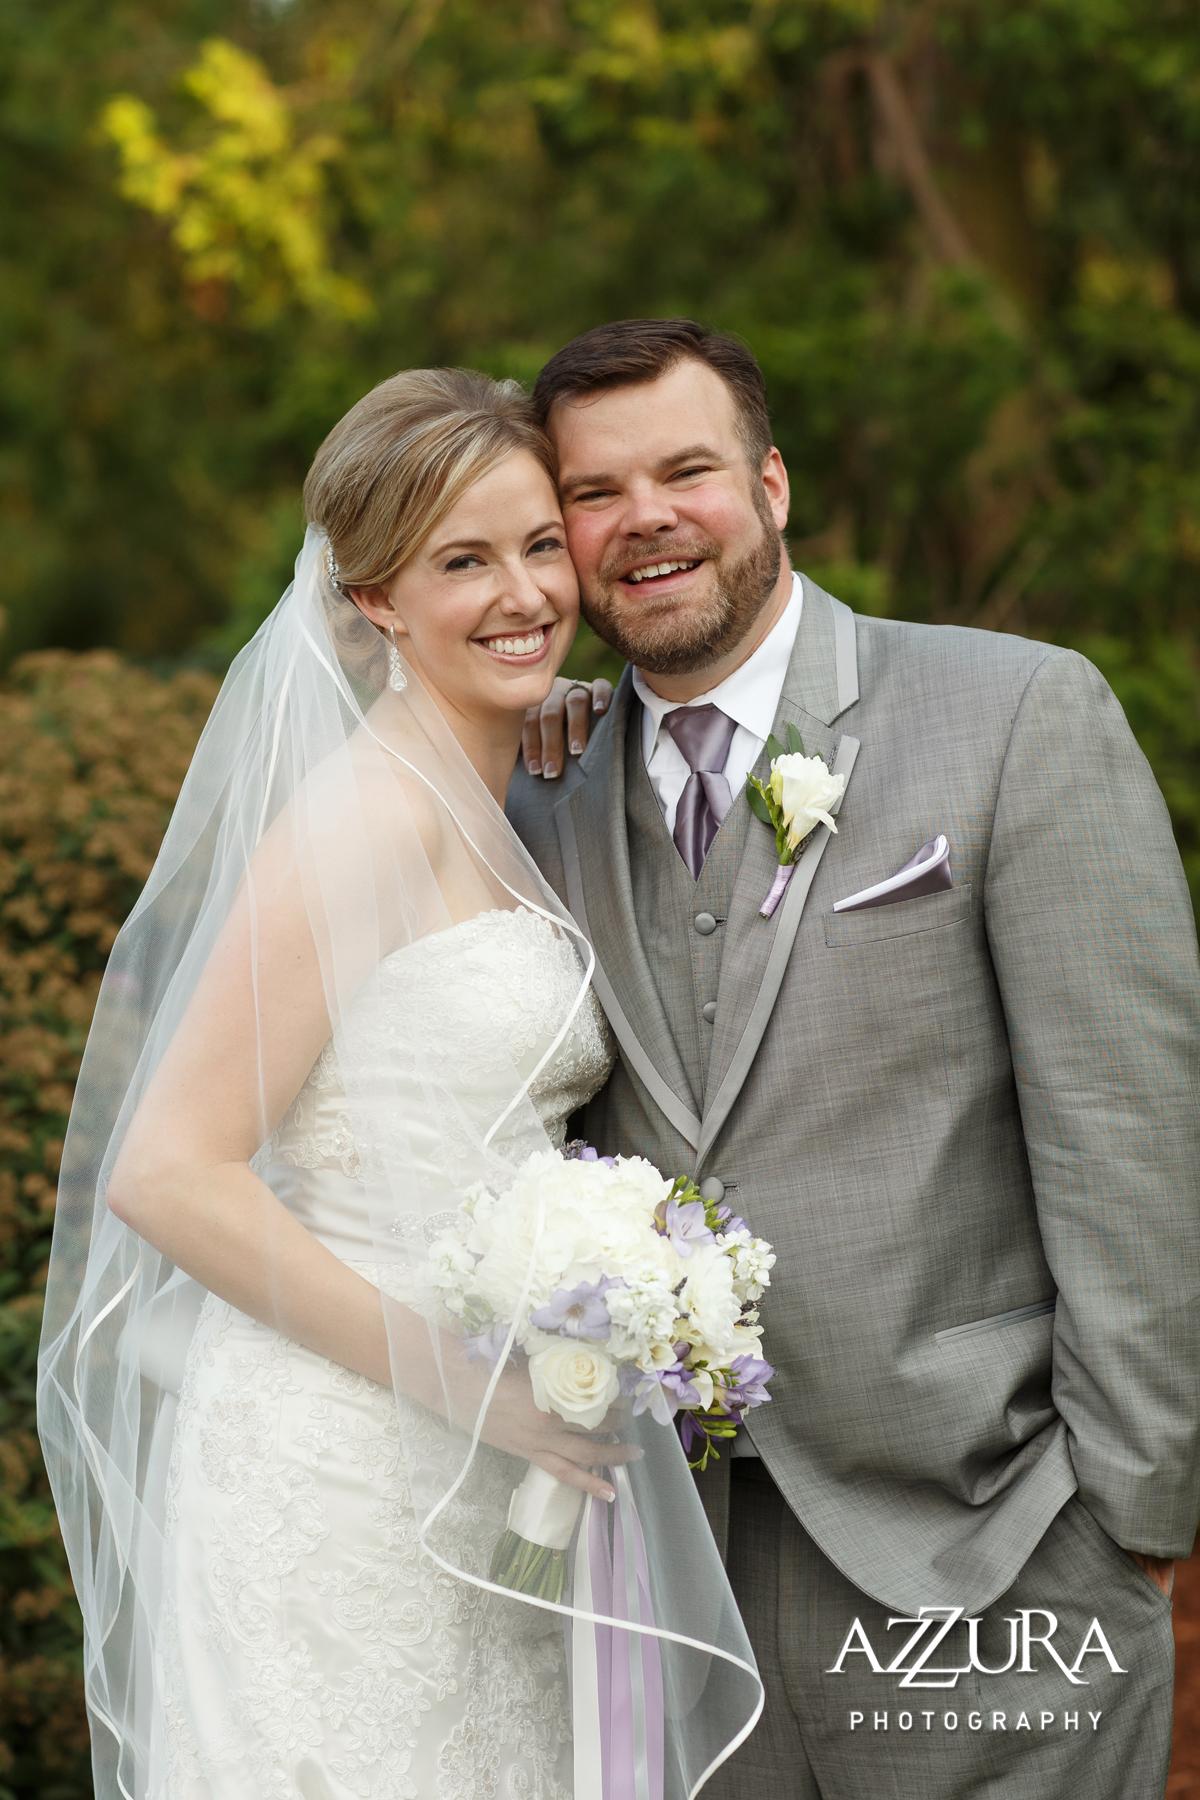 Laurel Creek Manor Wedding in Seattle | Seattle Bride & Groom wedding day photography | Perfectly Posh Events, Seattle Wedding Planner | Azzura Photography